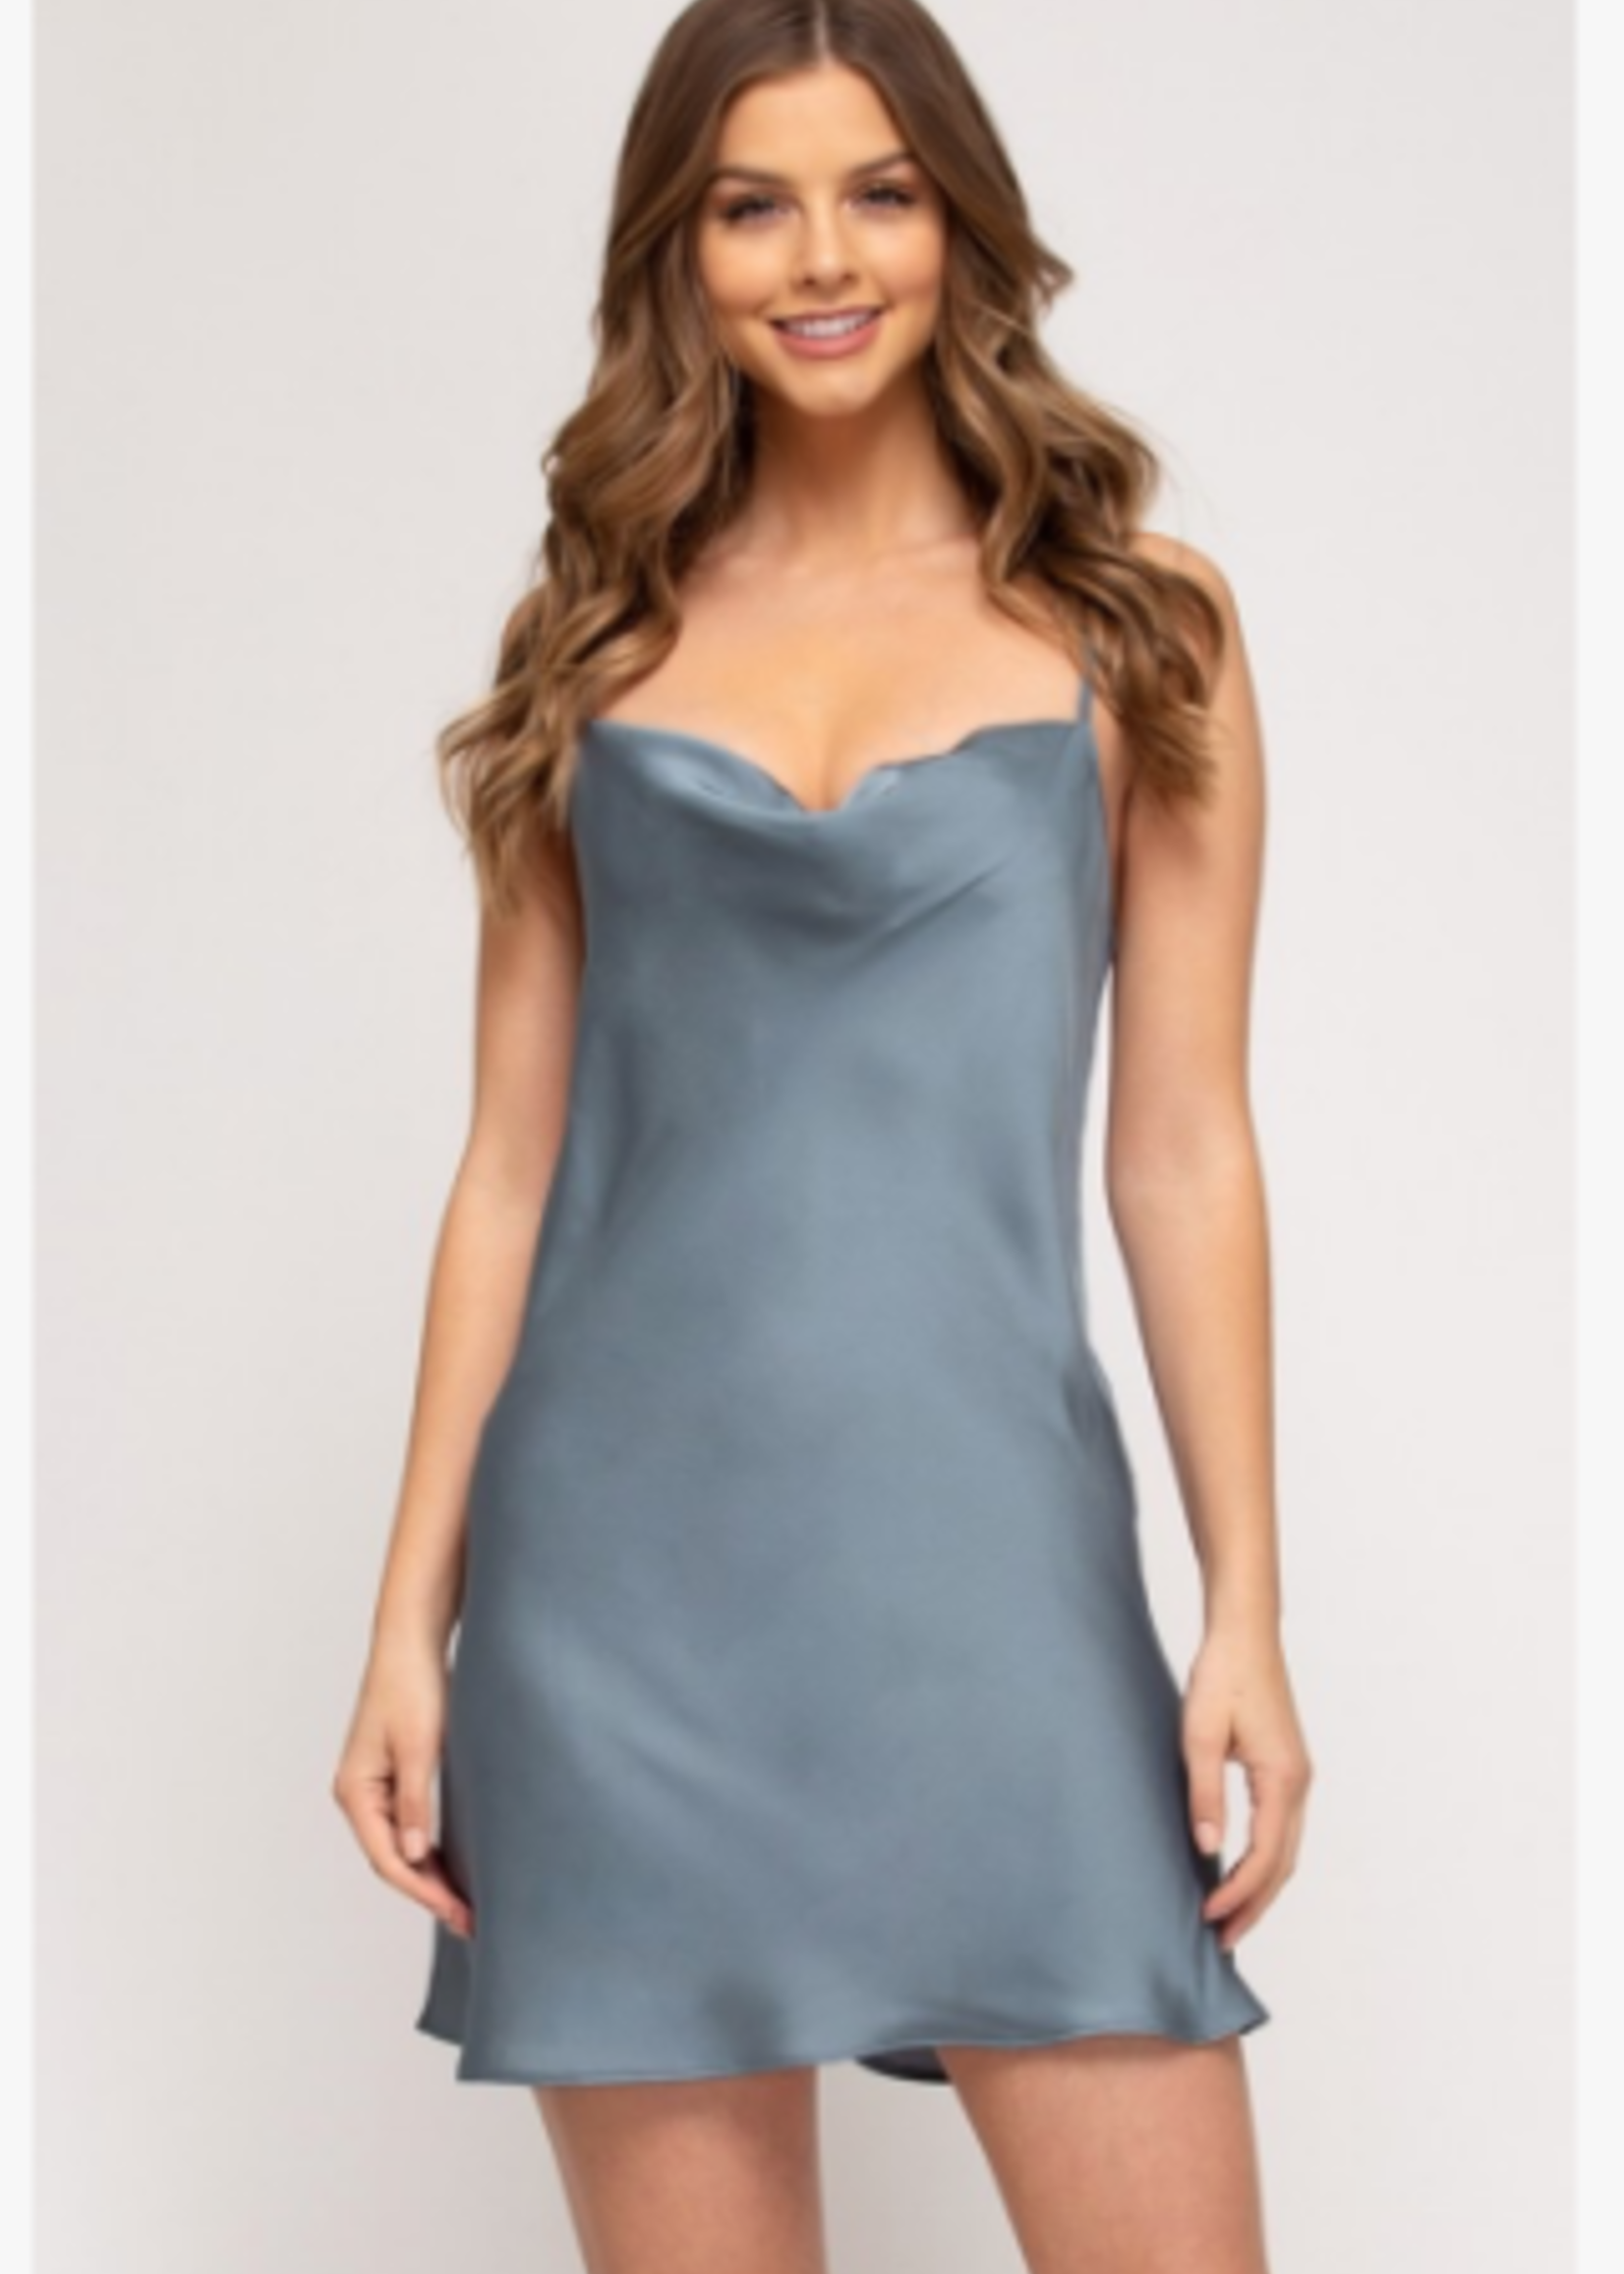 Satin Dreams Come True Dress (4 Colors Available)